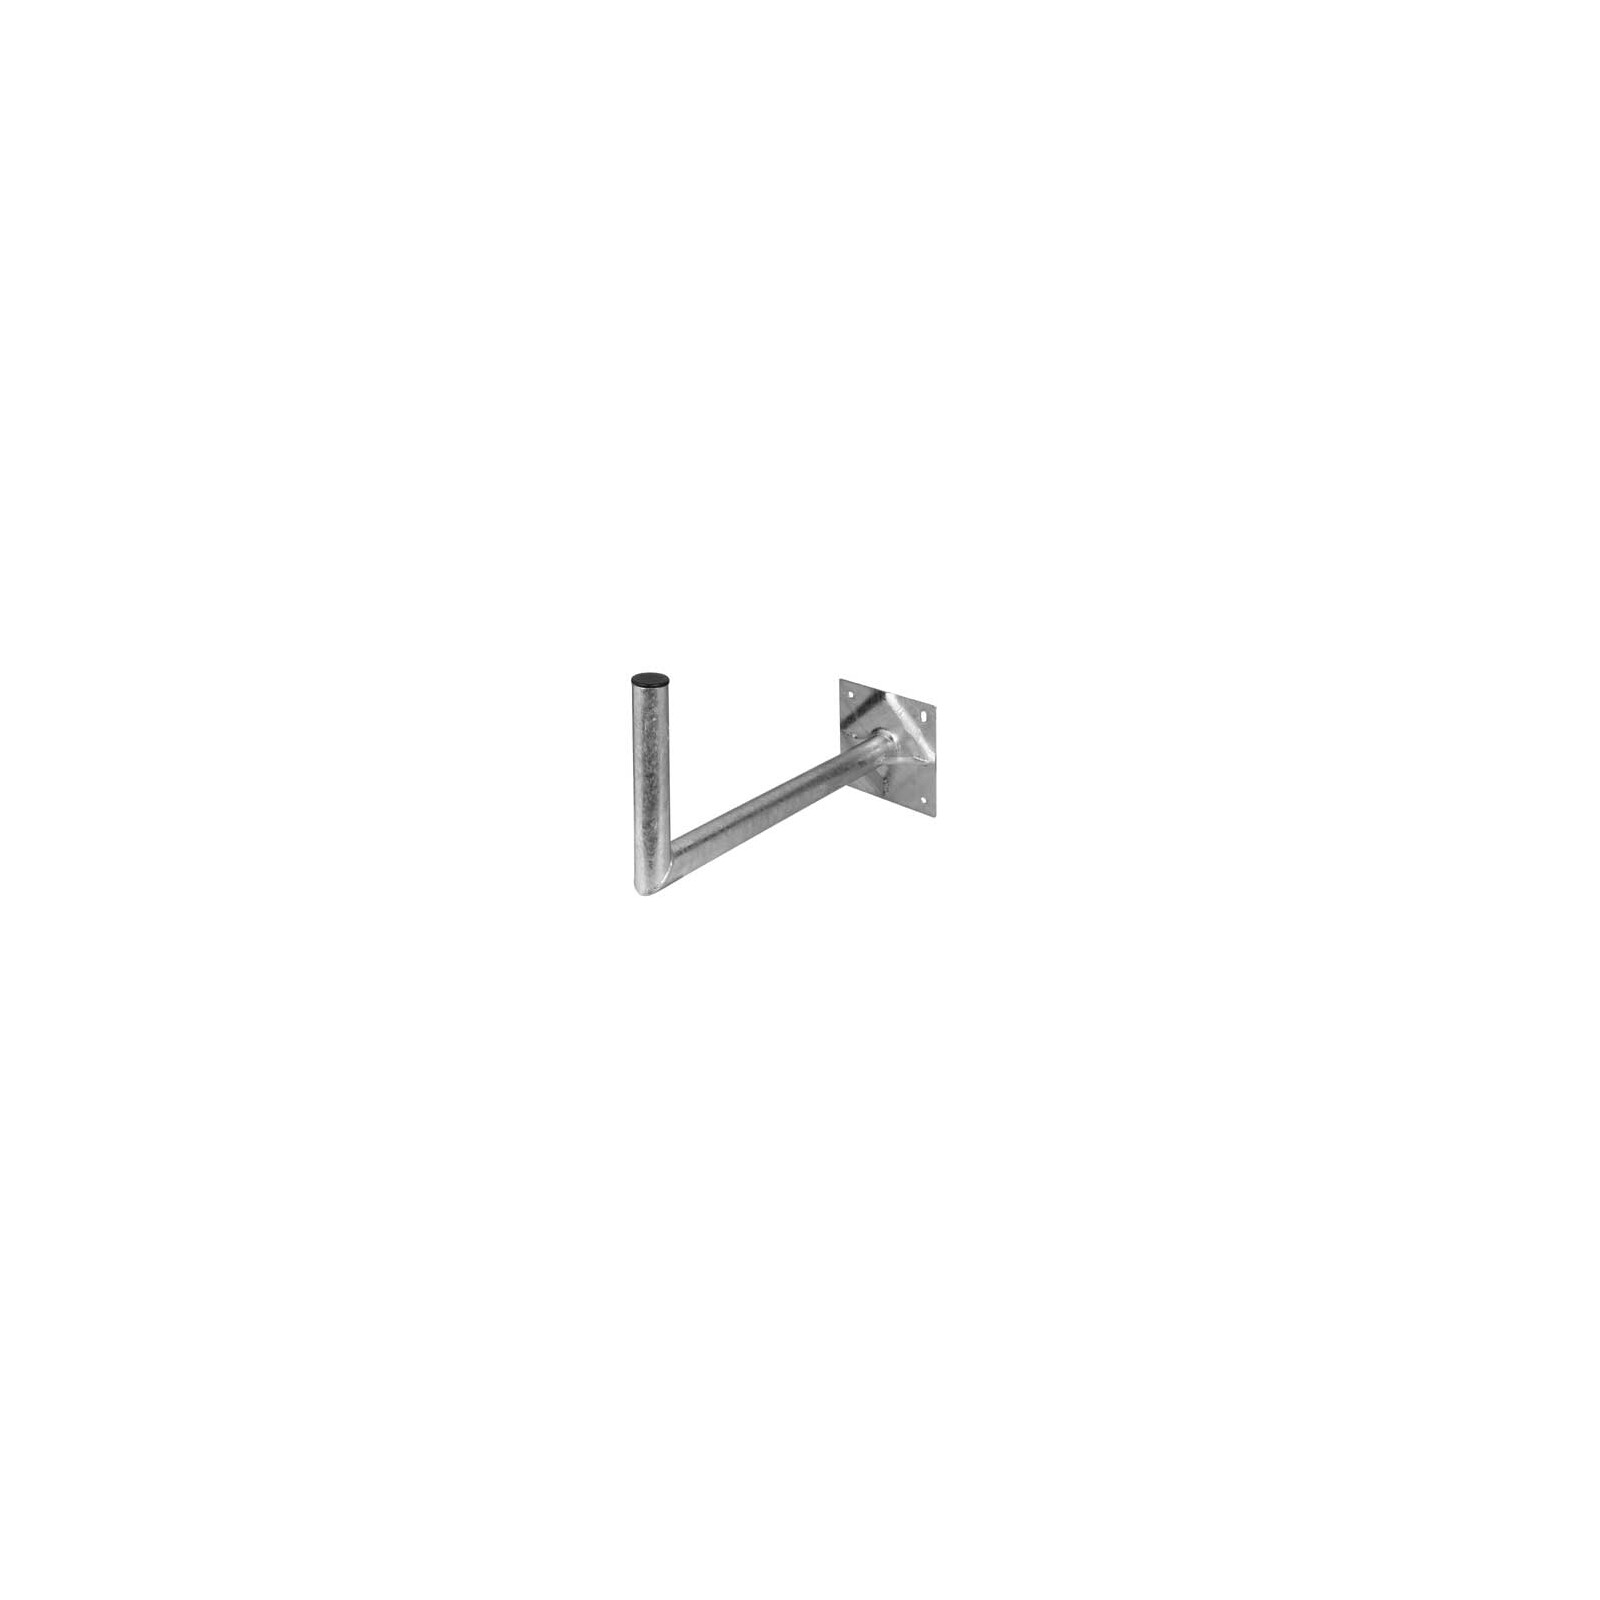 Hama 44203 SAT-Wandhalterung, feuerverzinkt, 60 cm Wandabsta